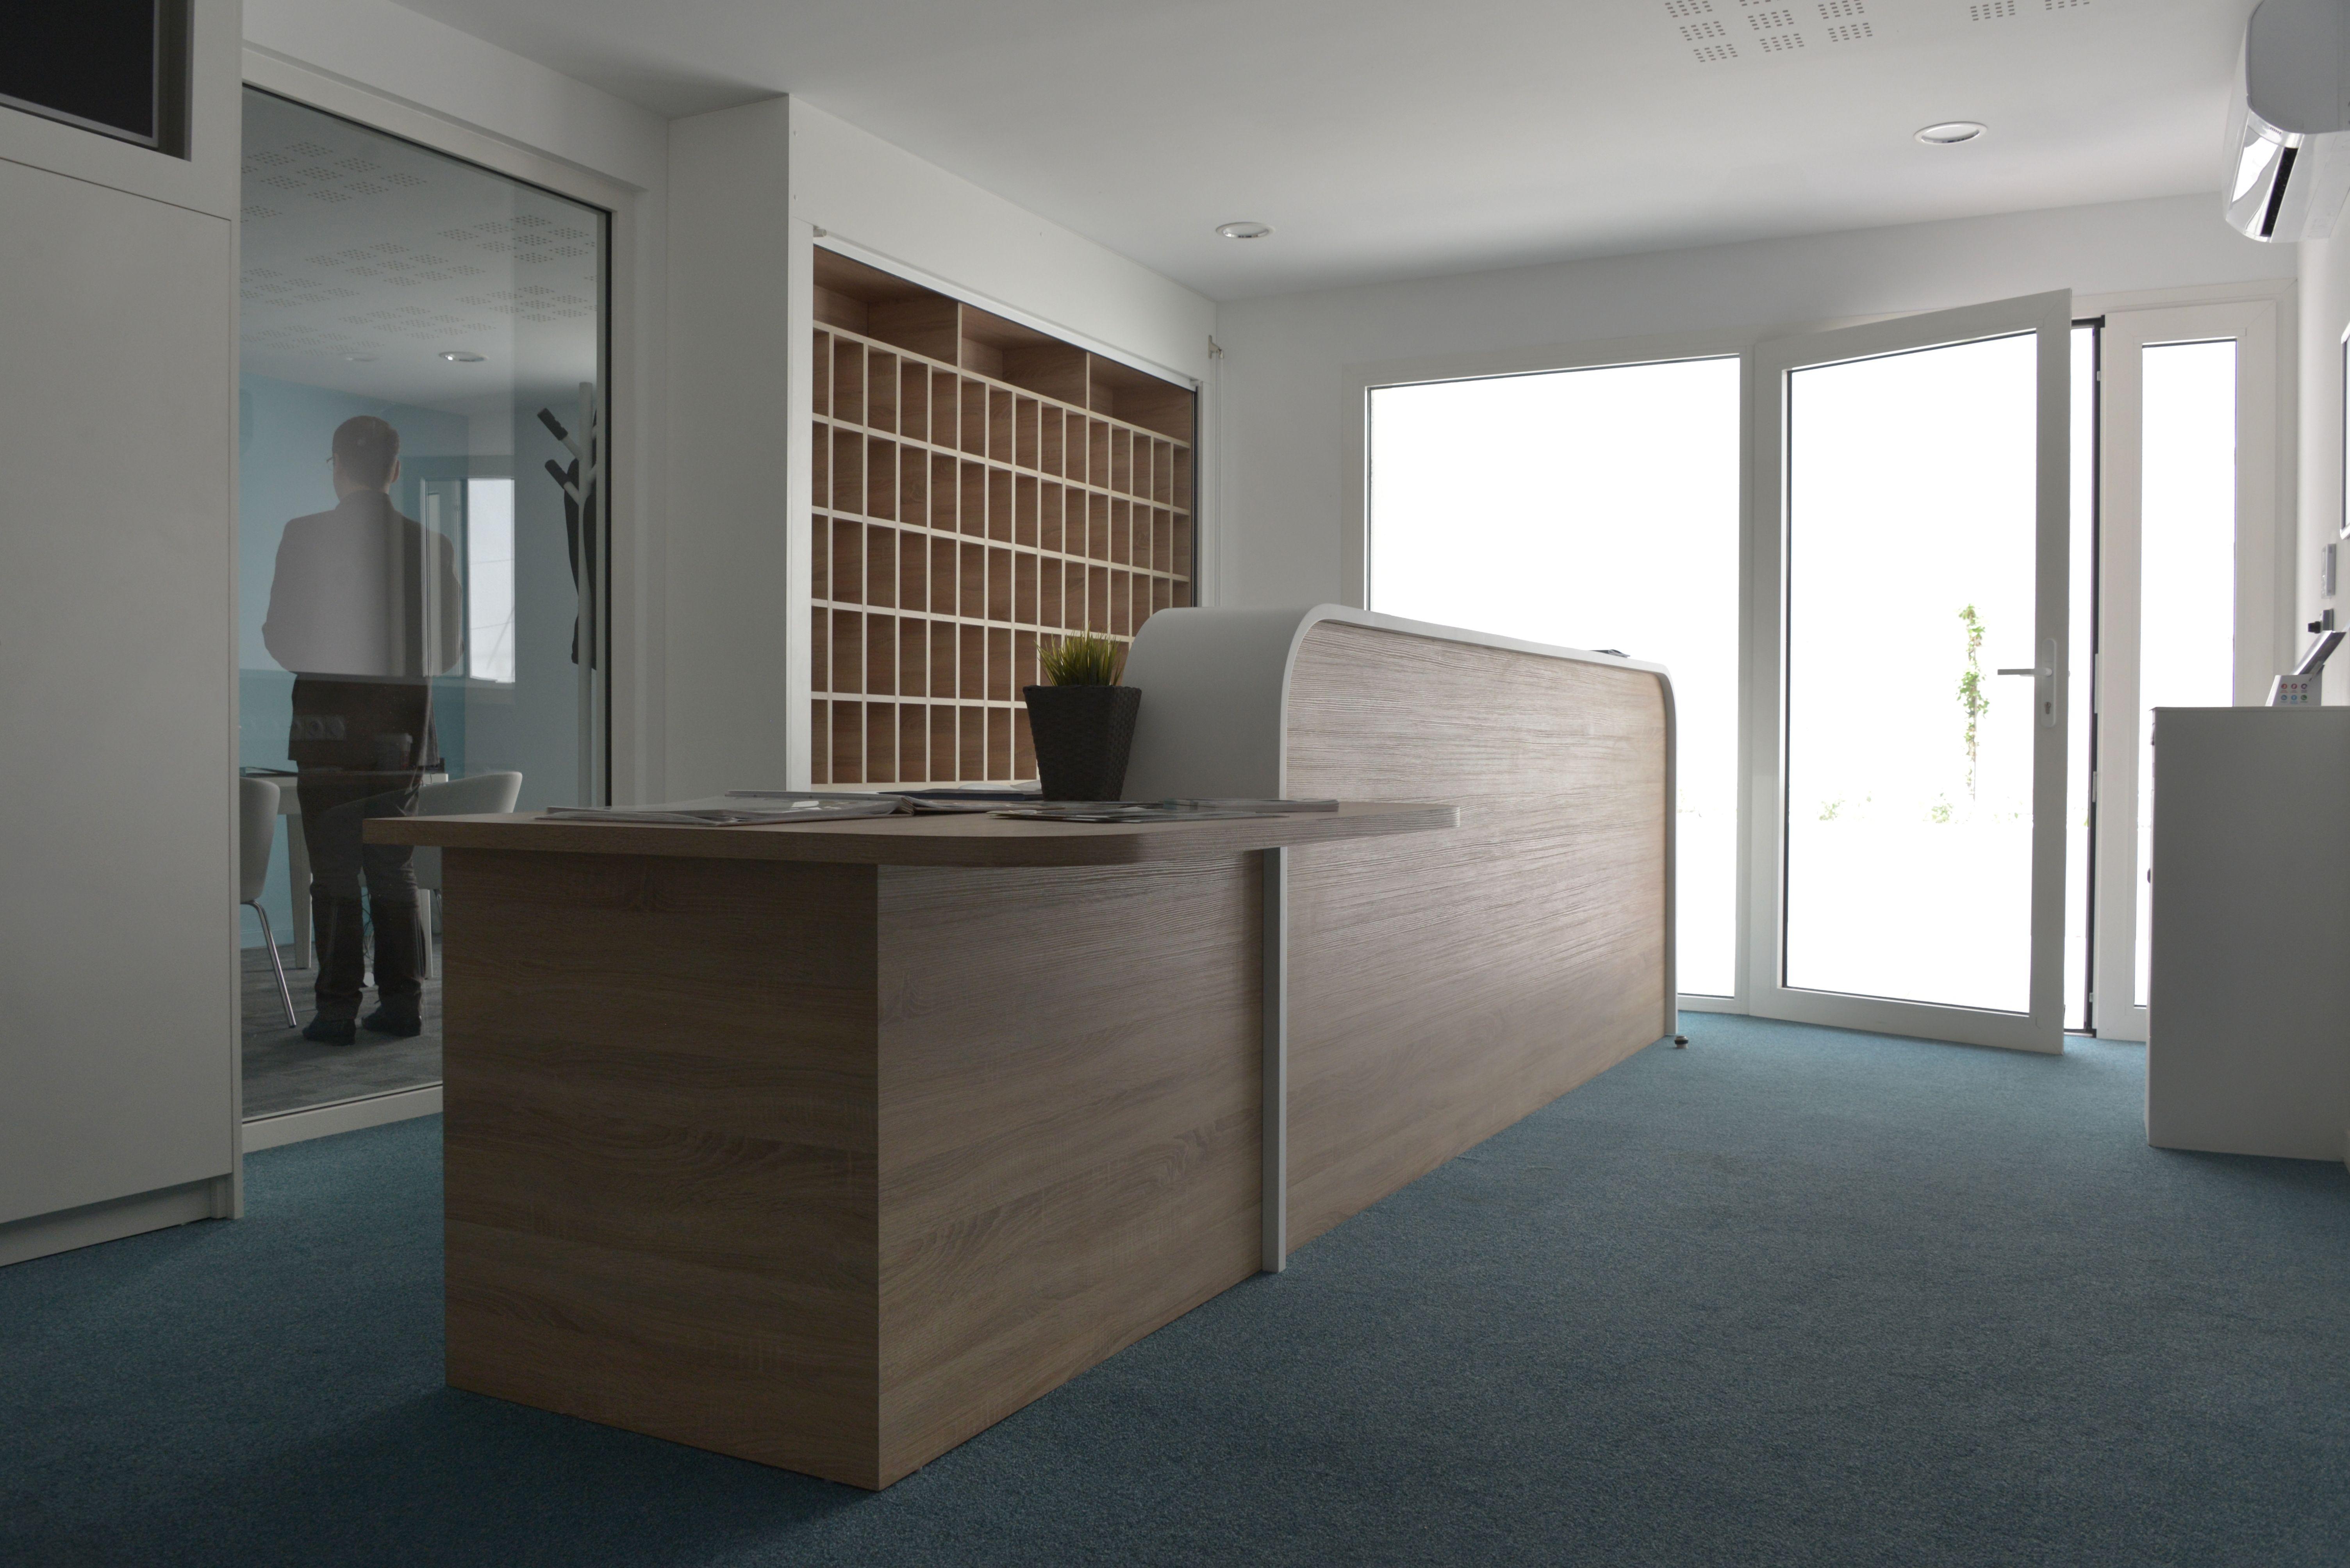 Comptoir De Reception Avec Meuble A Courrier Chene Et Laque Blanc Comptoir De Reception Plan Cuisine Comptoir